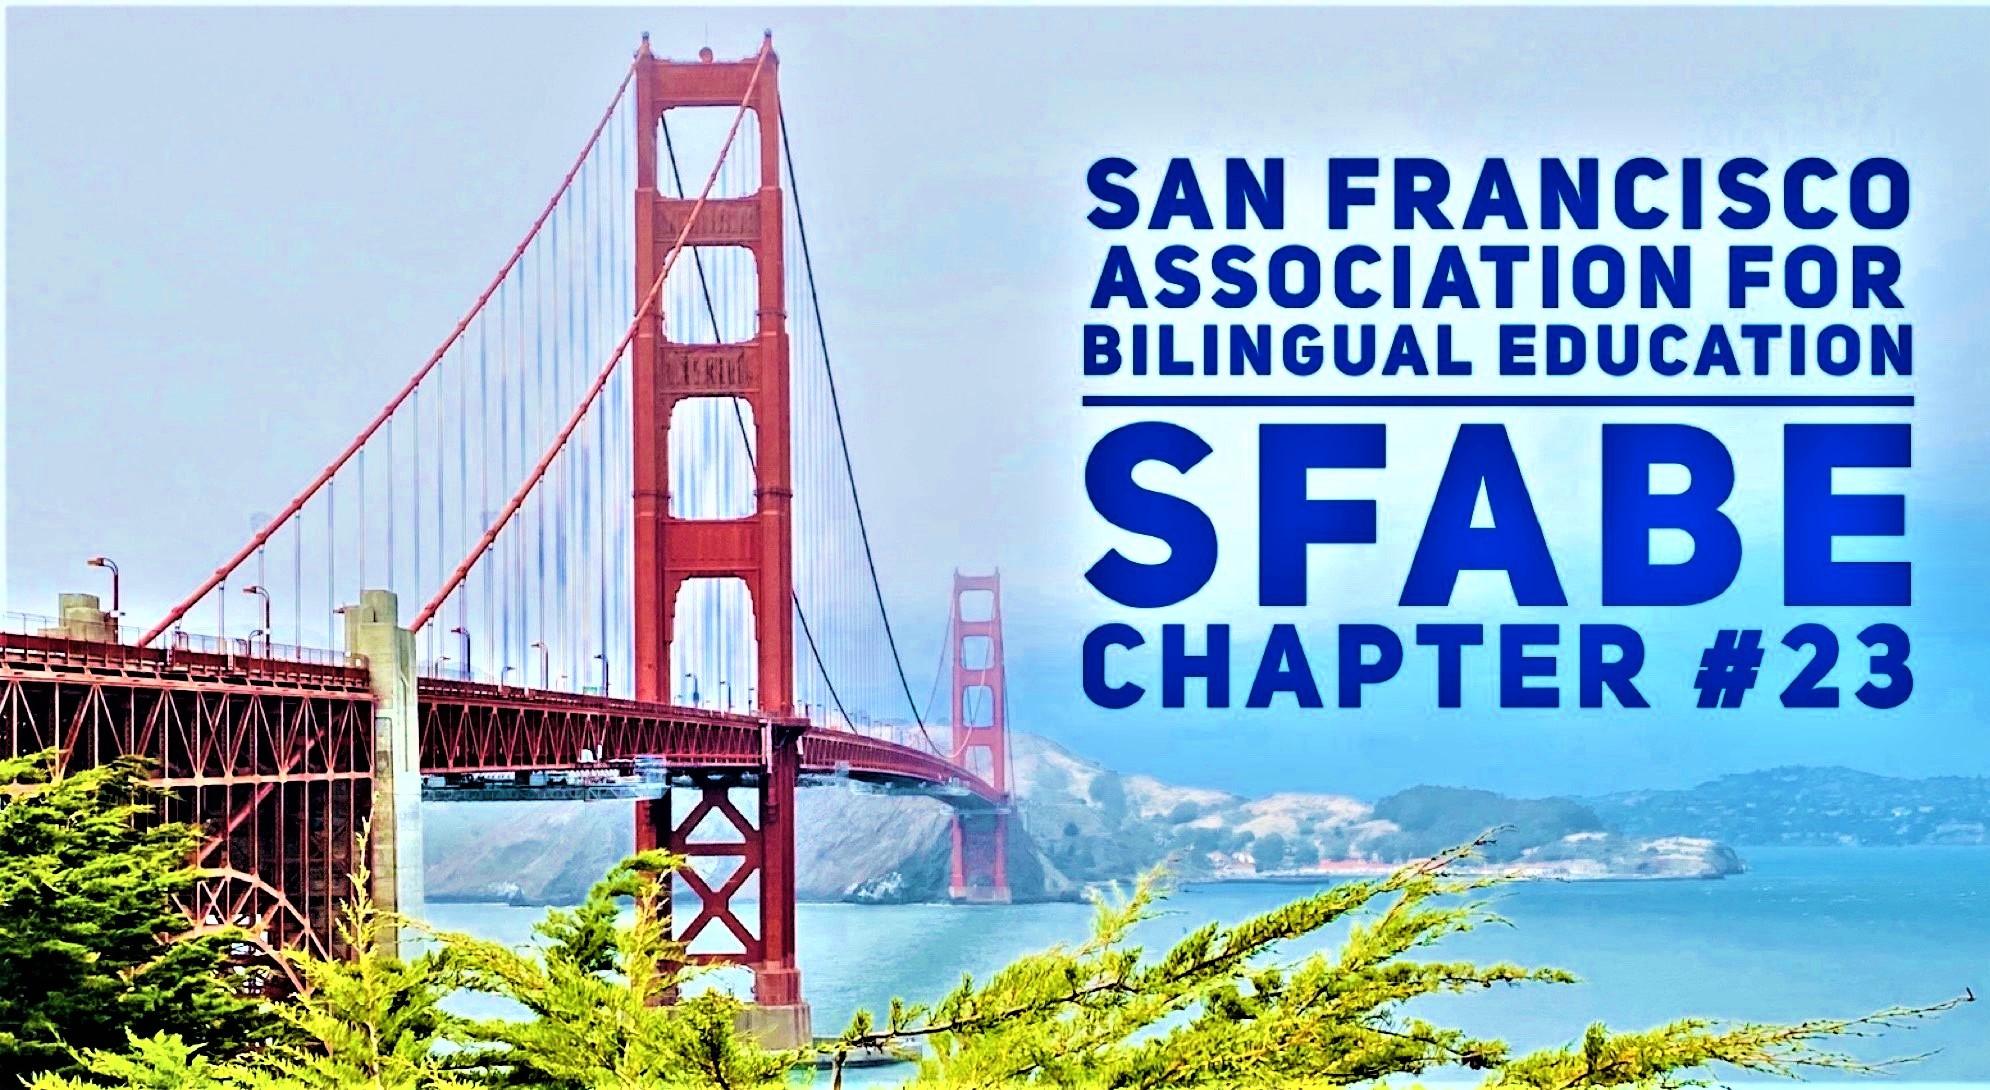 San Francisco Association for Bilingual Education